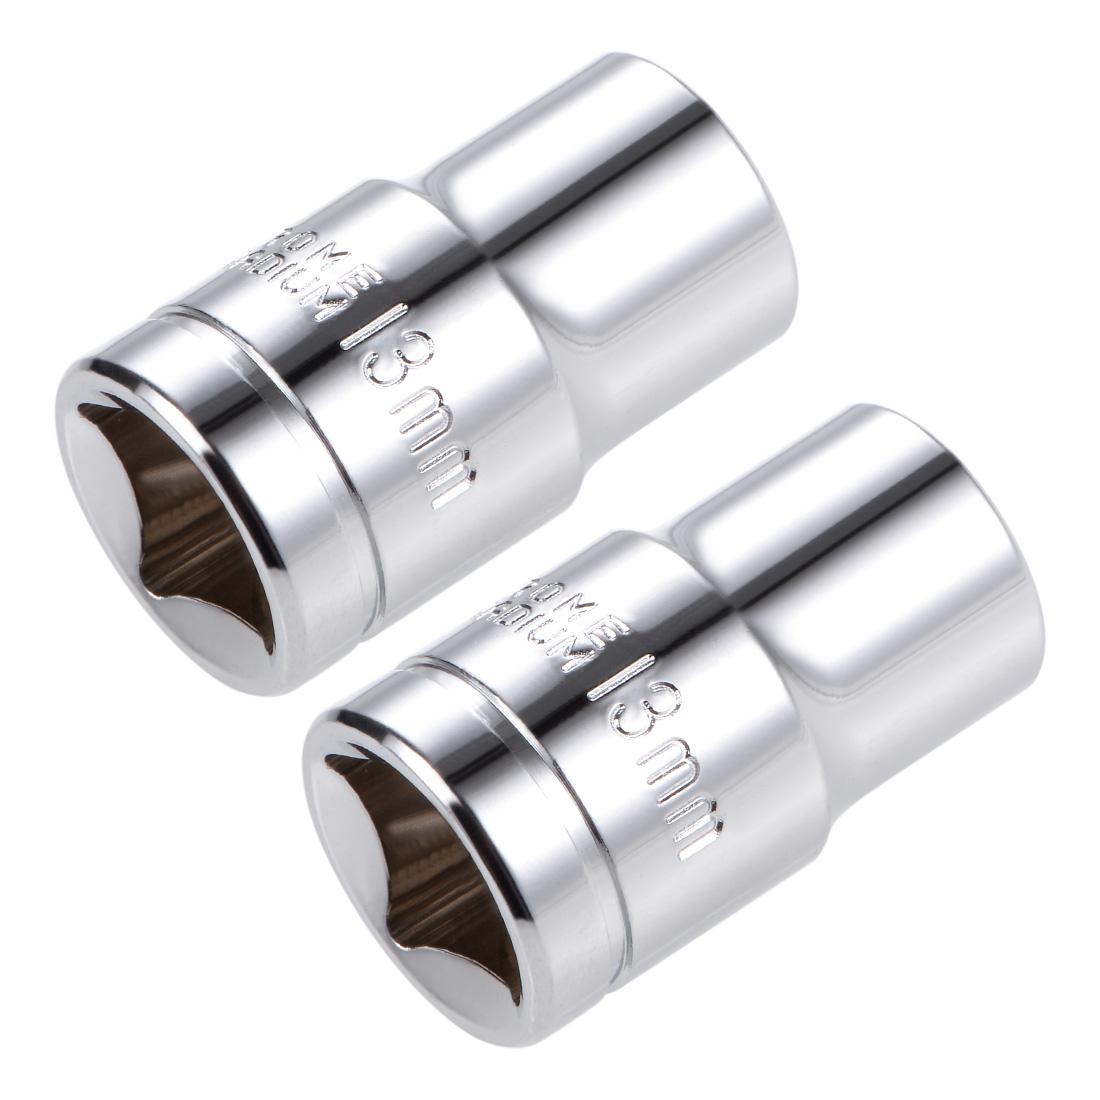 1/2-inch Drive E13 Universal Spline Socket Shallow 12 Point Cr-V Steel 2 Pcs